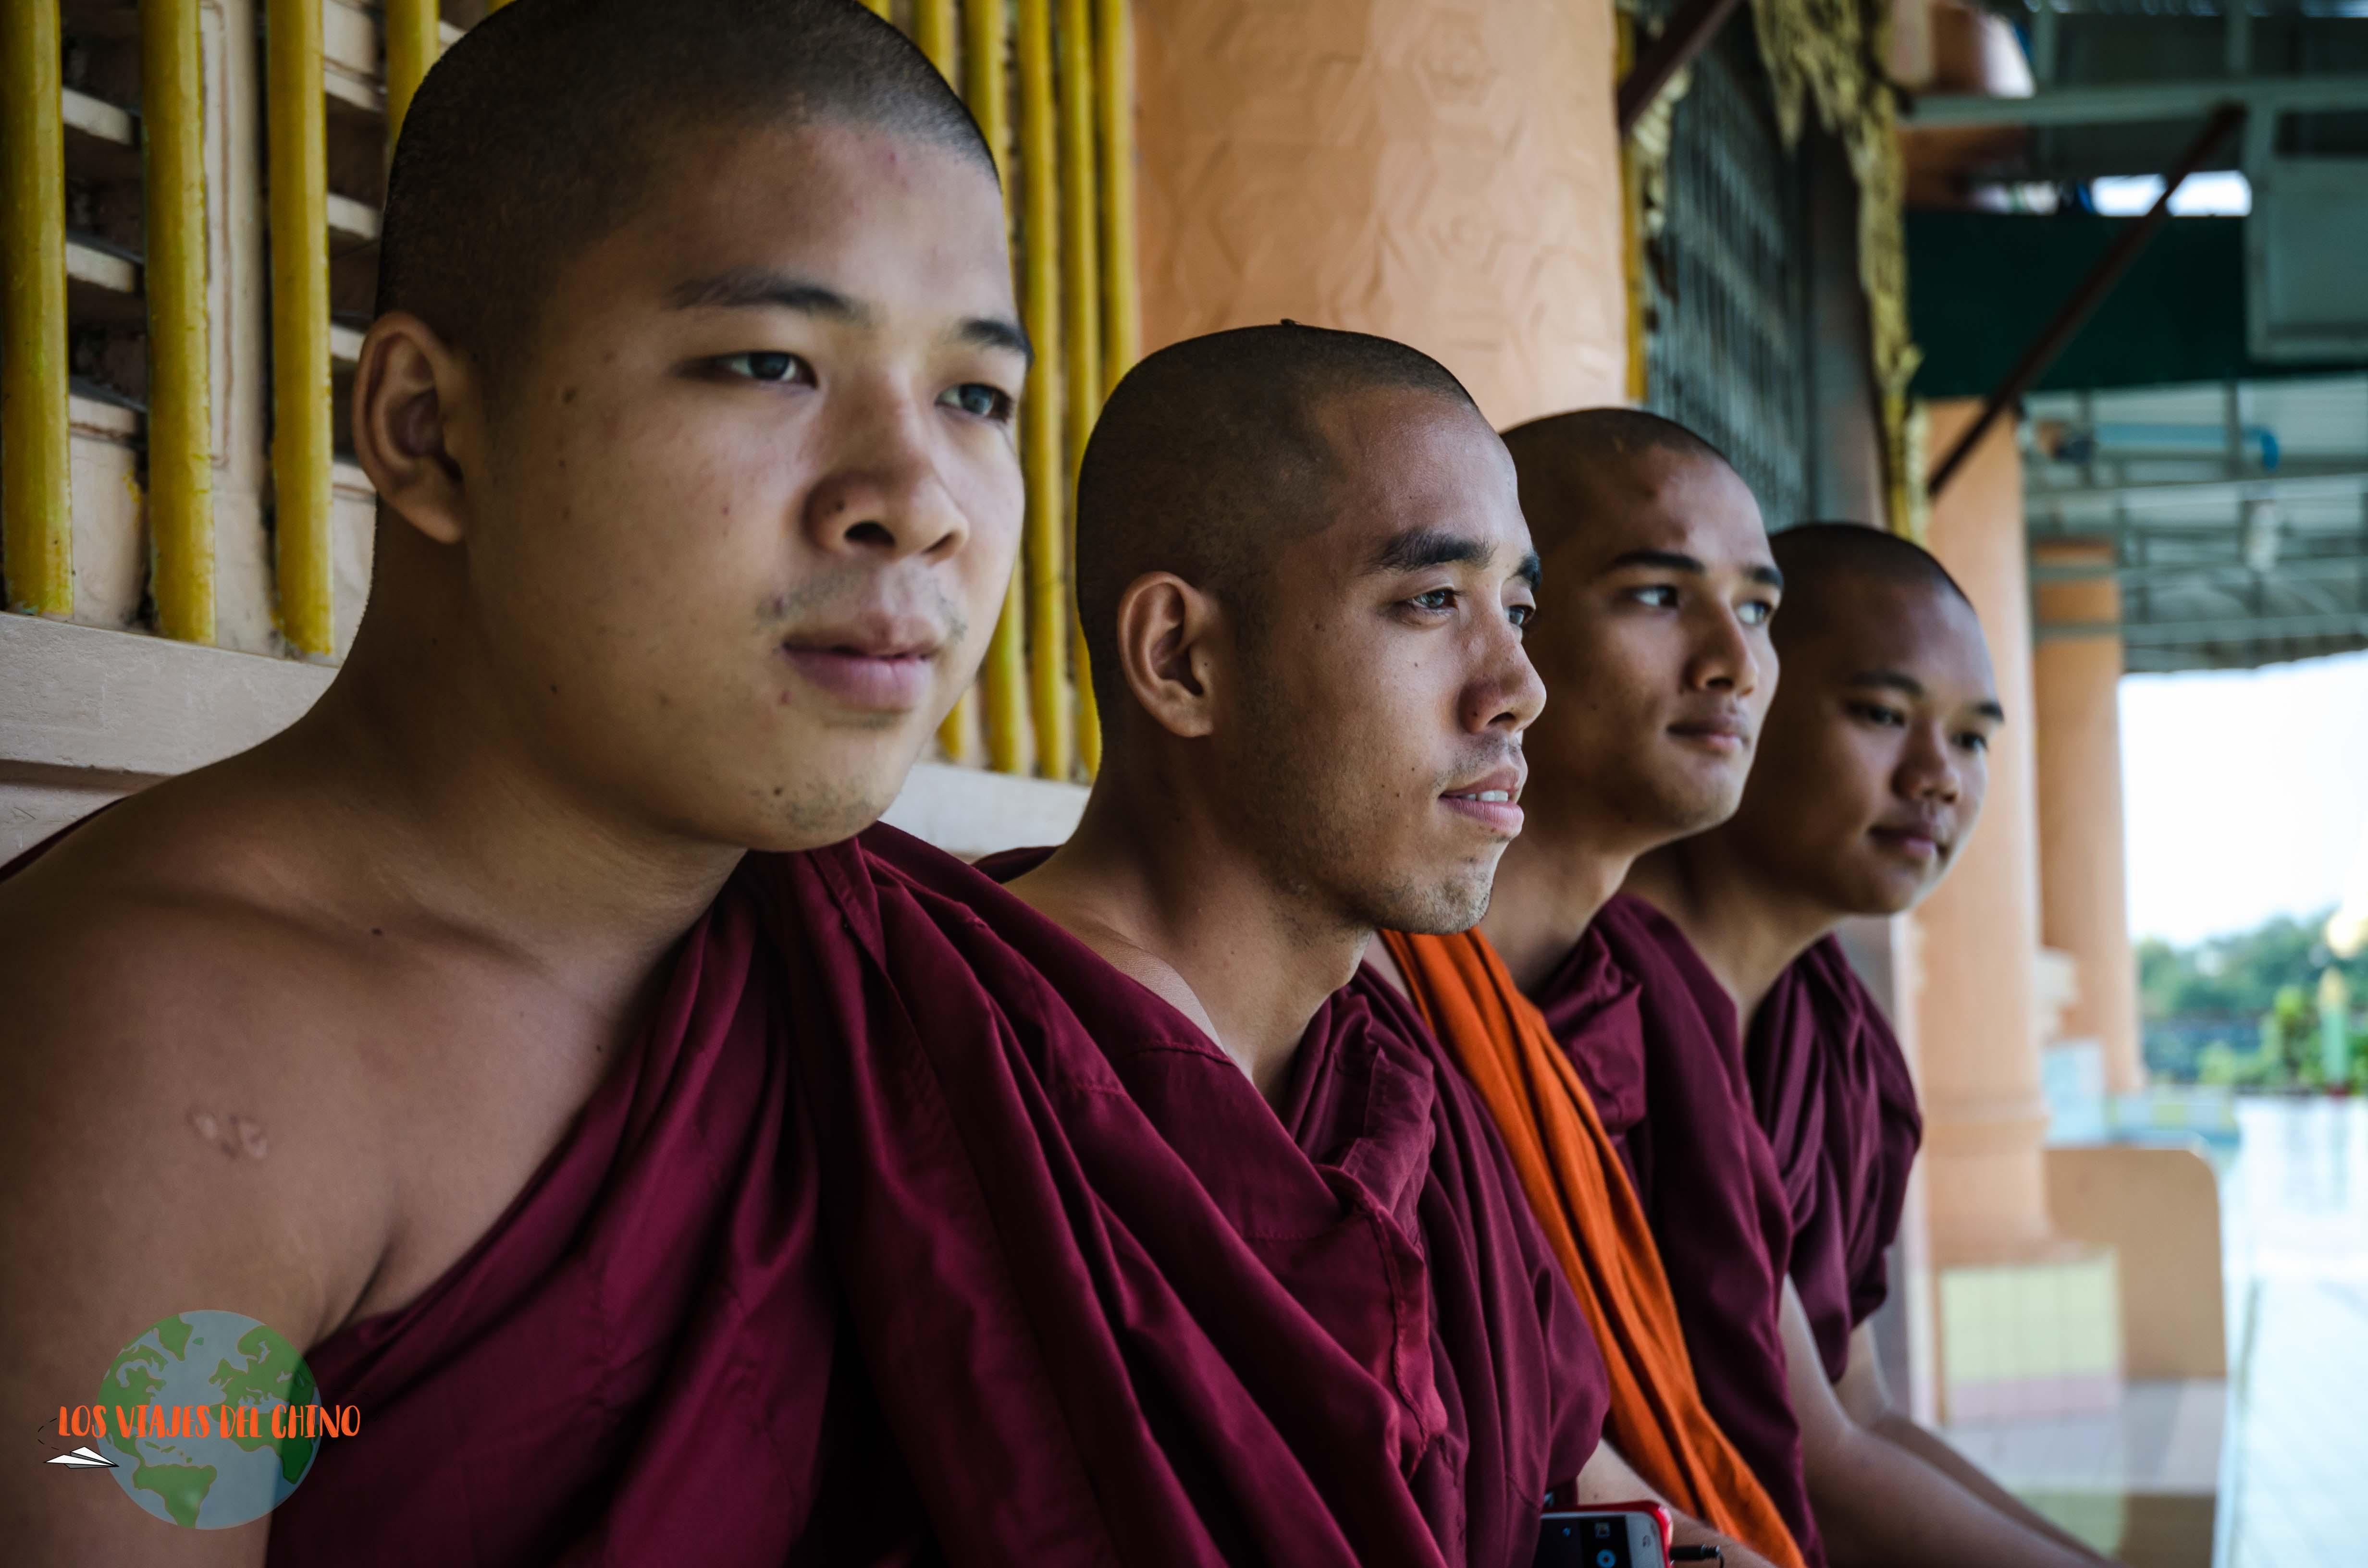 monjes de Birmania